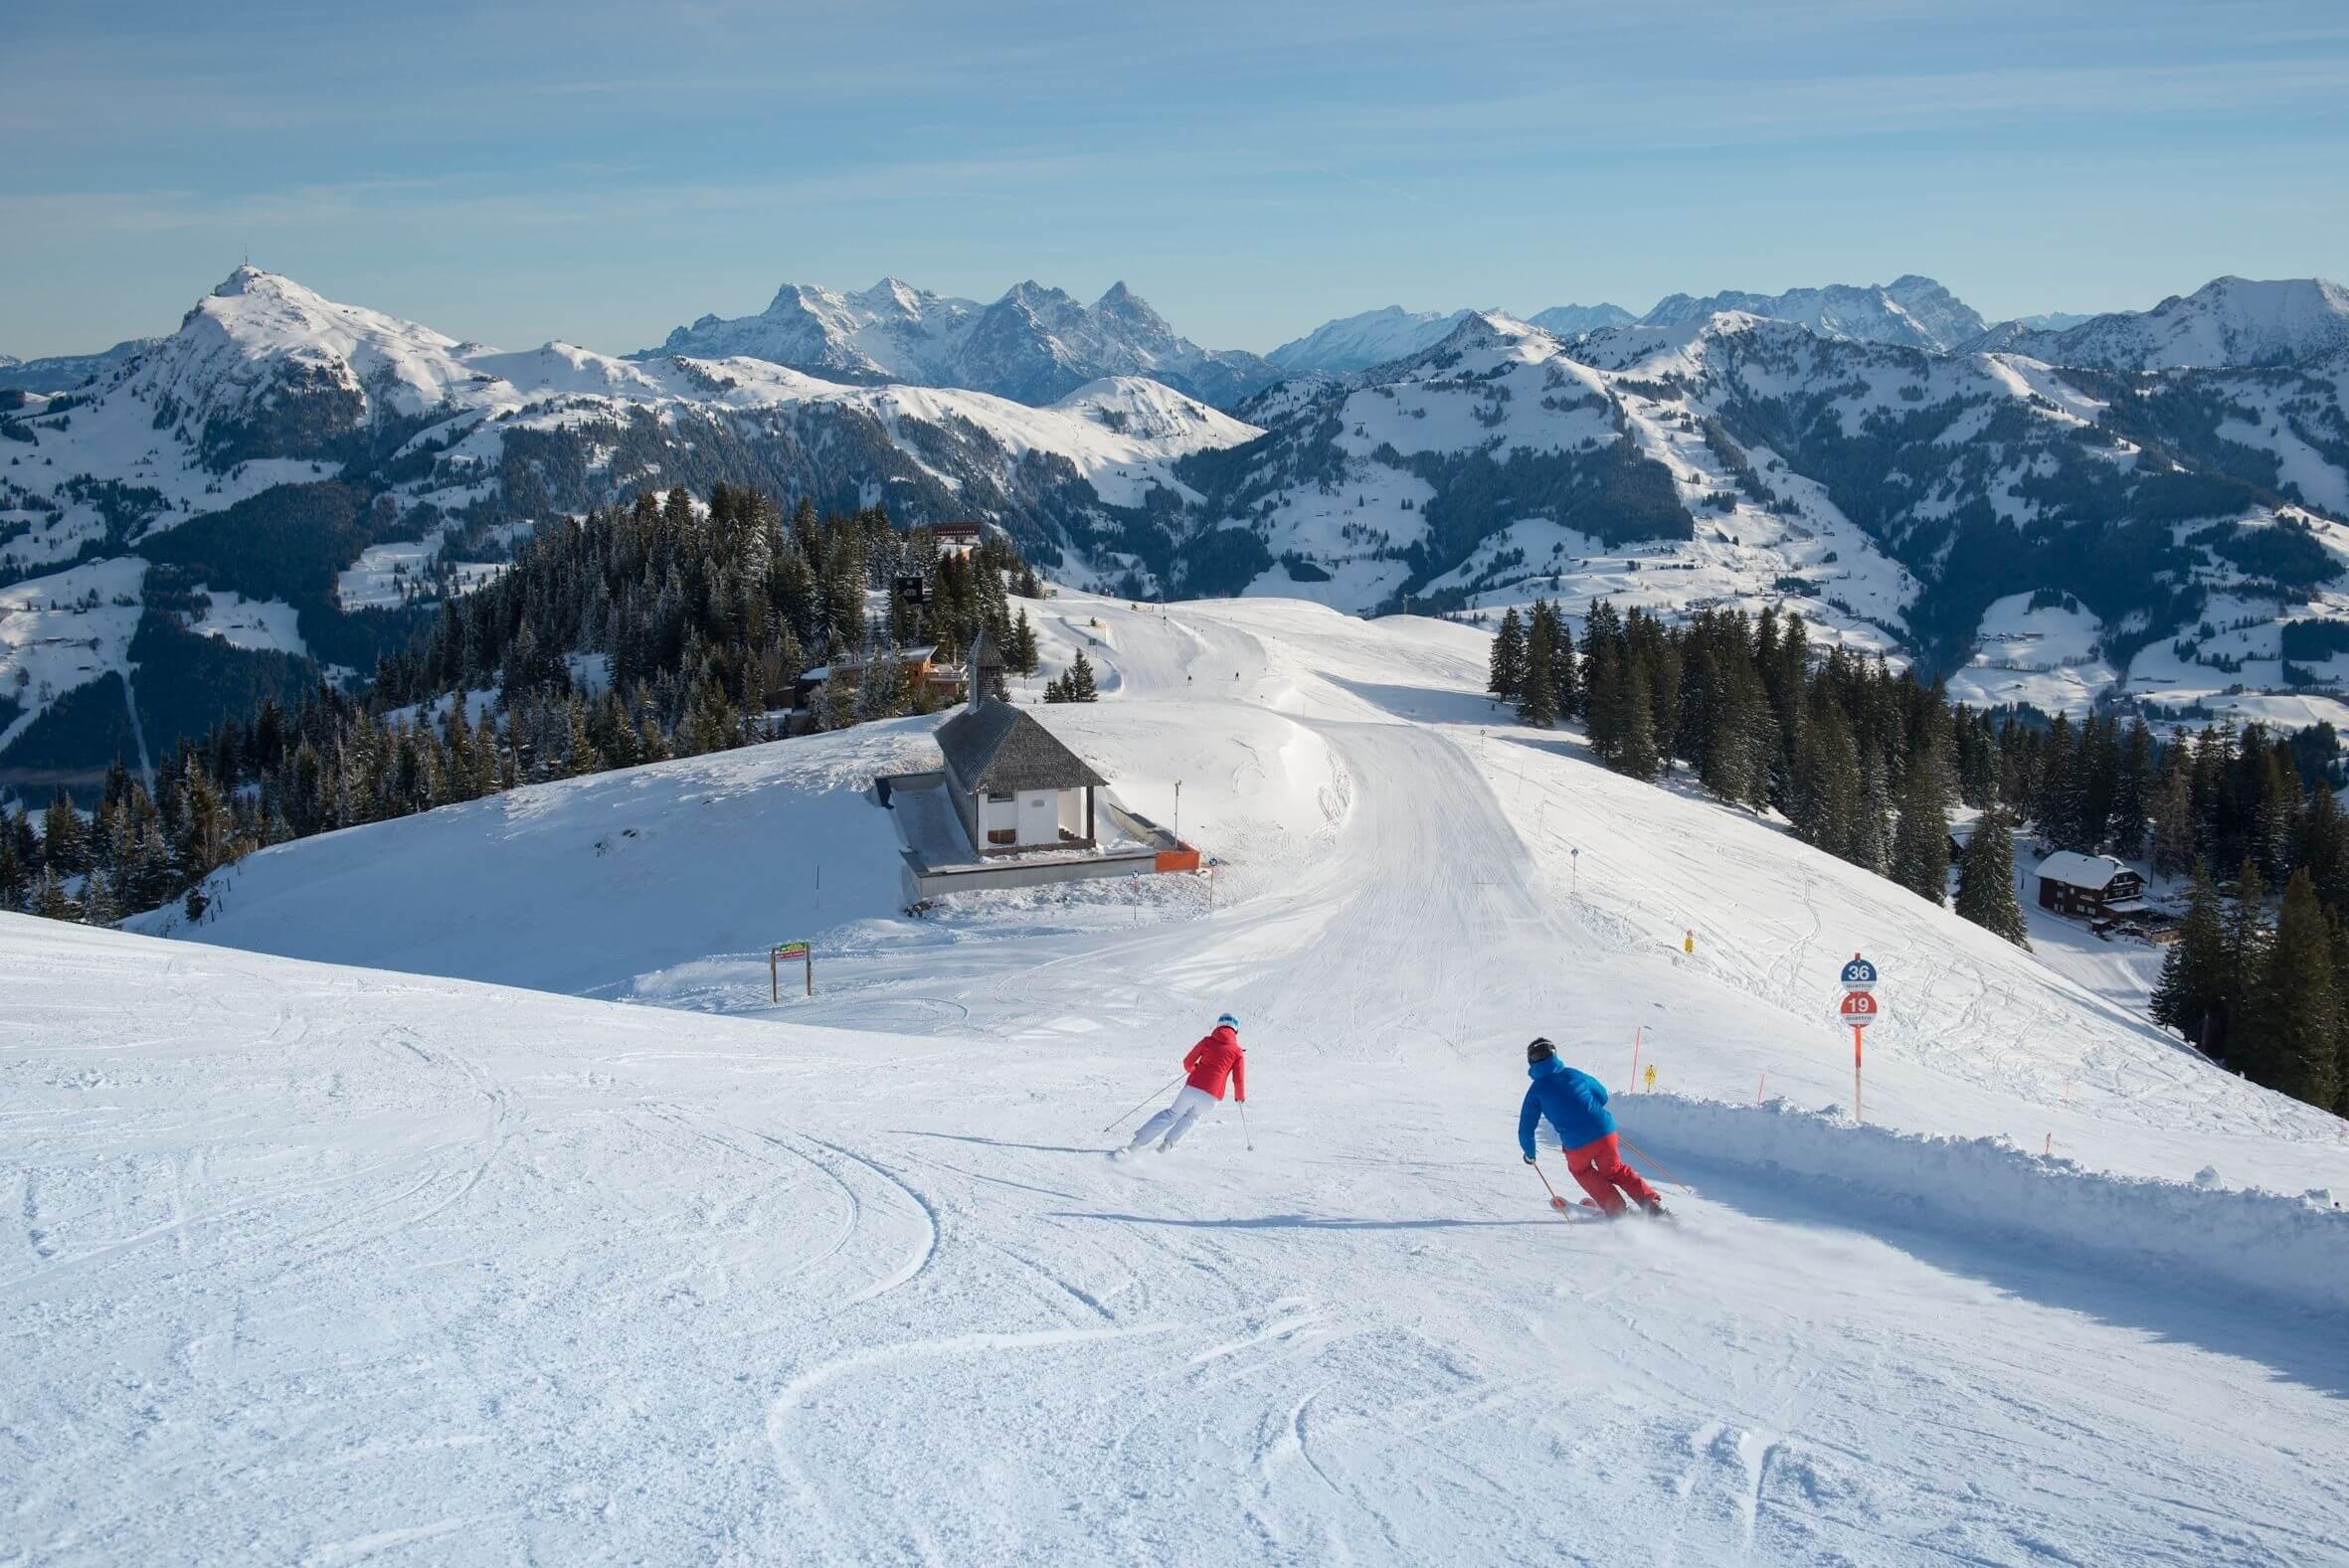 2016_kitz_winter_01_michael_werlberger - skiing